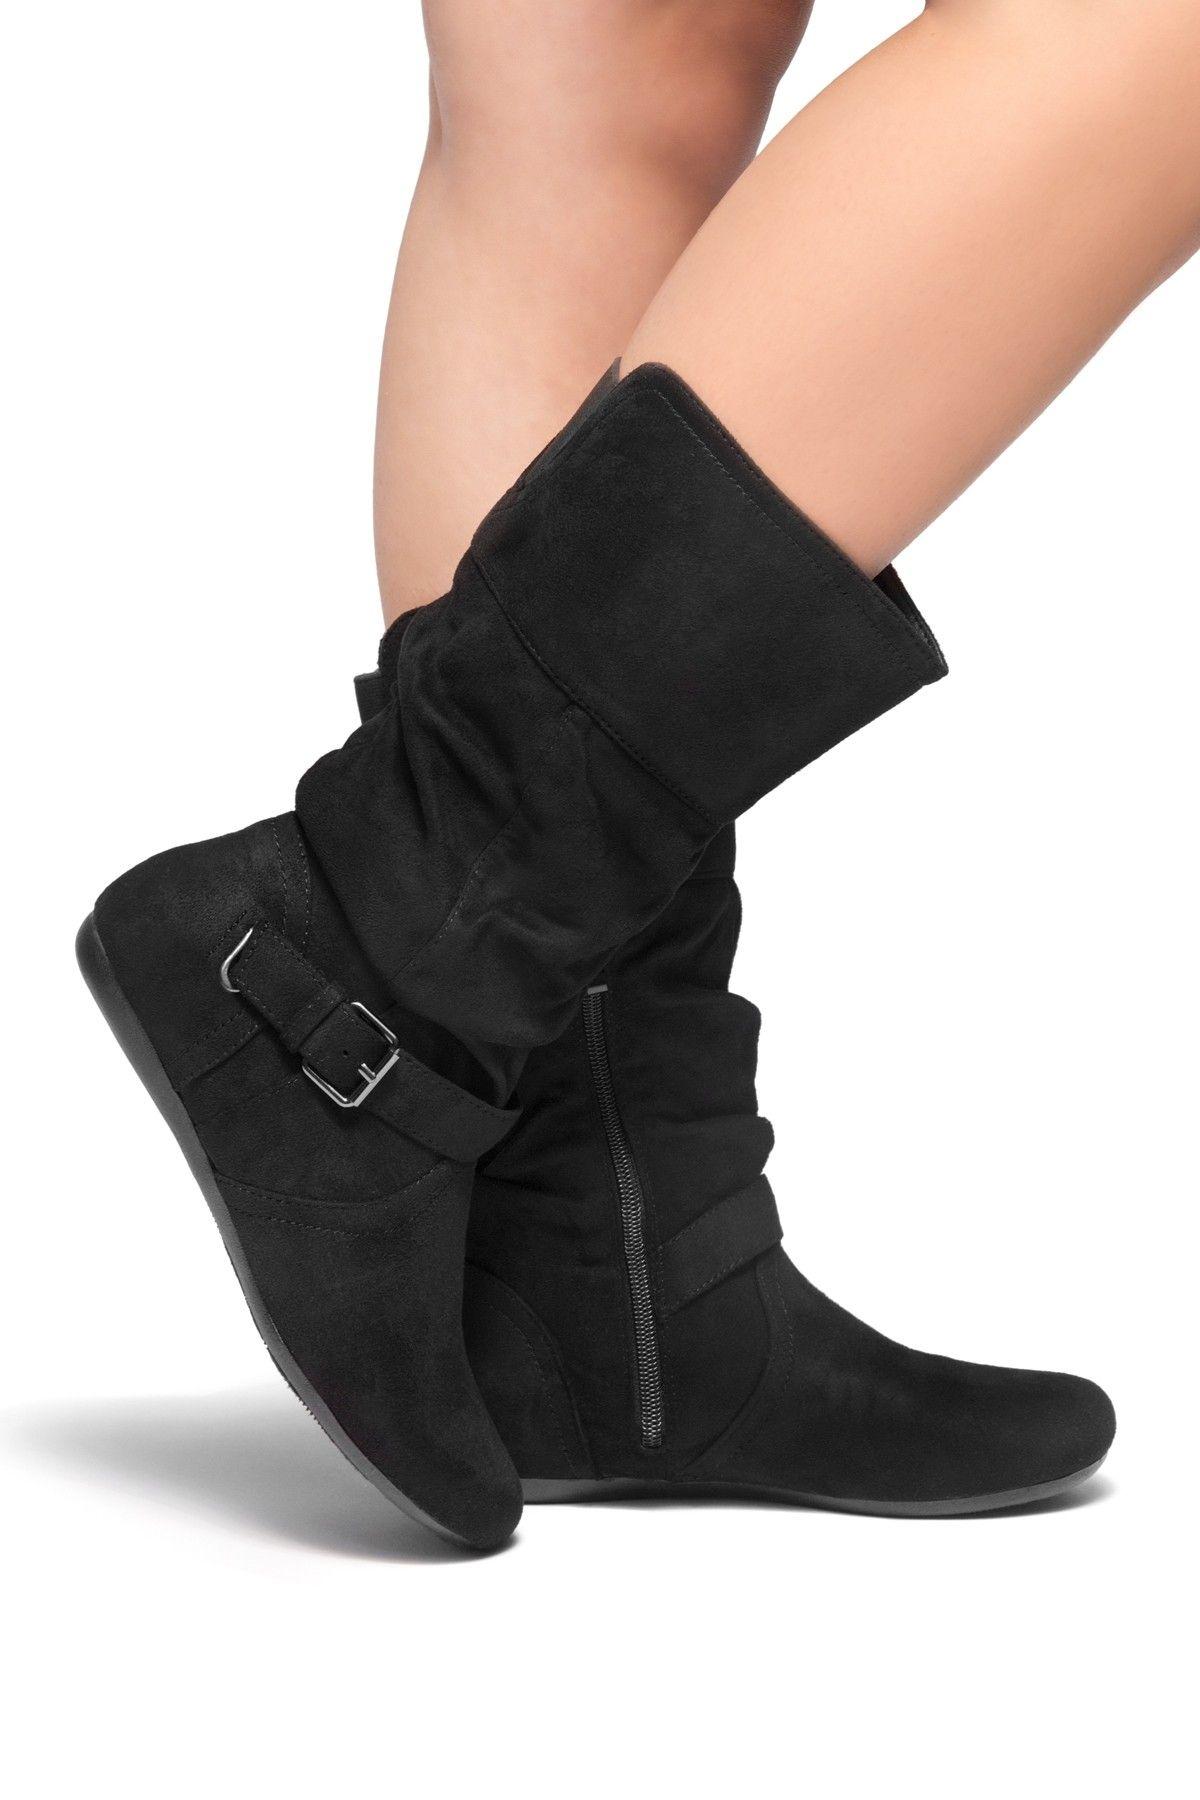 7d1b8e84db46 Buy the HerStyle Knolla Women s Fashion Calf Flat Heel Side Zipper ...